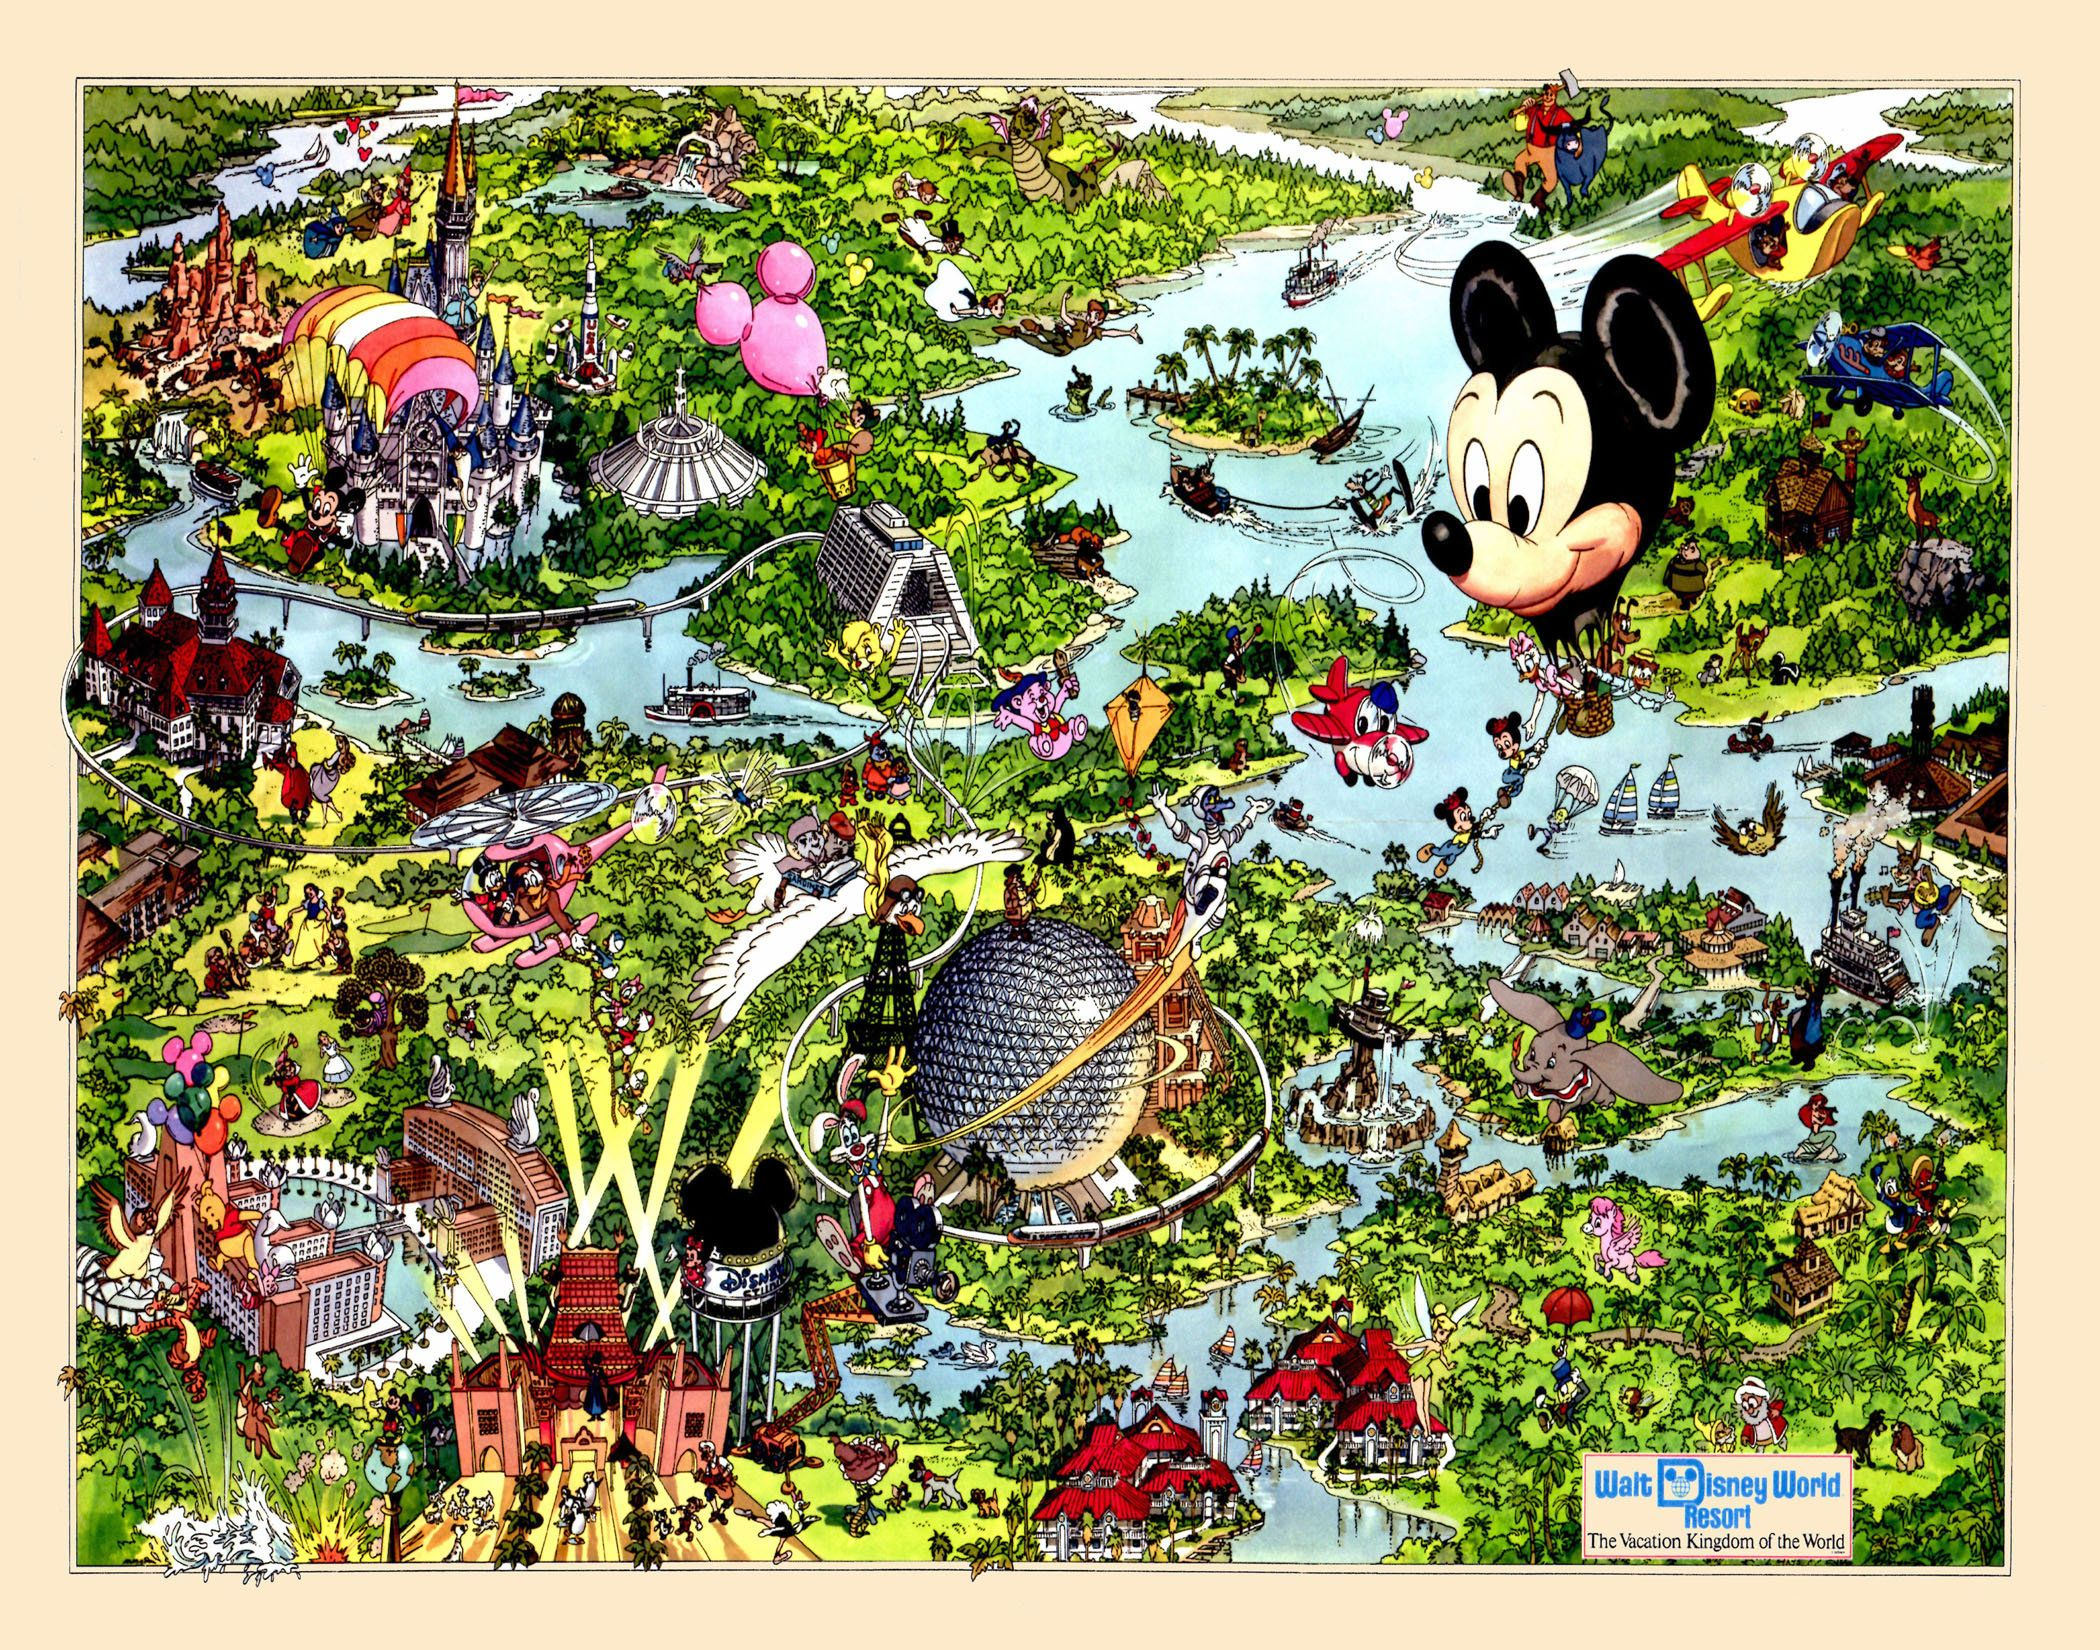 Disney World Map - Disneyland - Map - Print - Poster ...